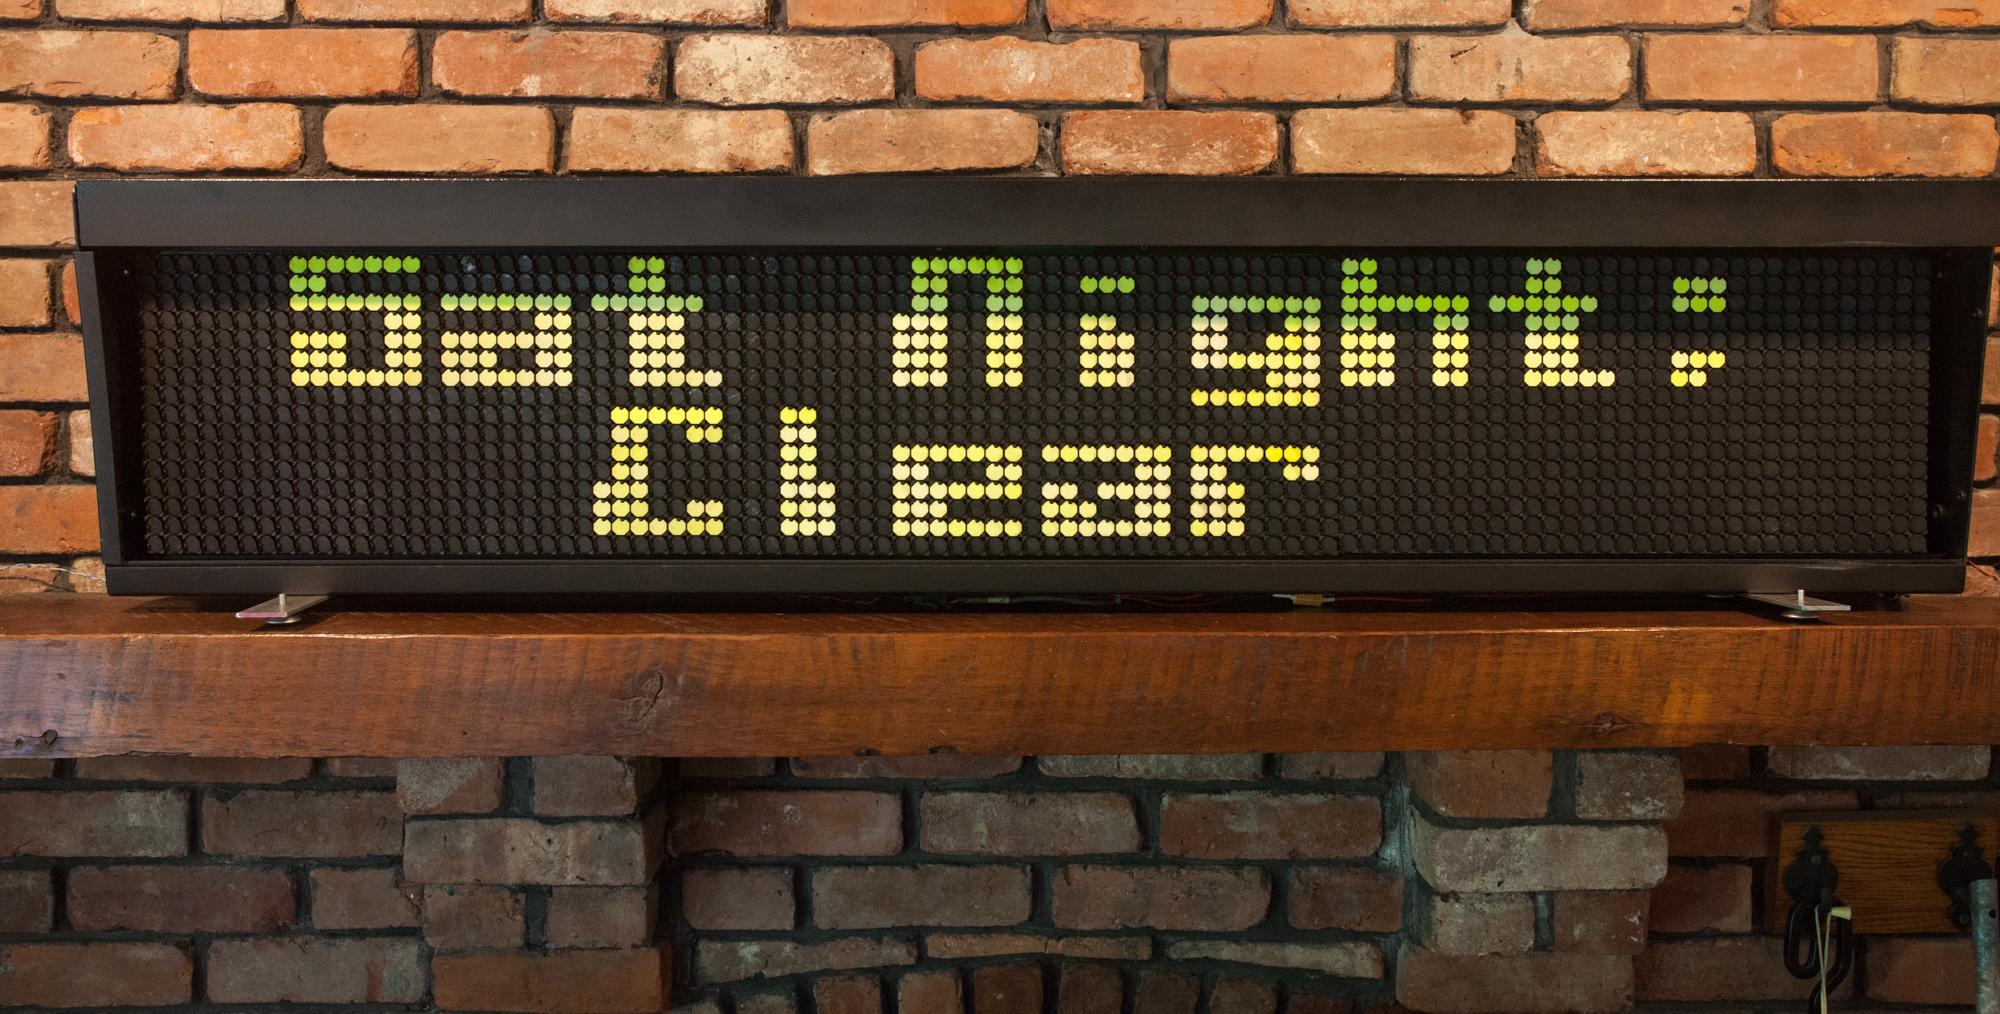 Flip-dot displays at Maker Faire